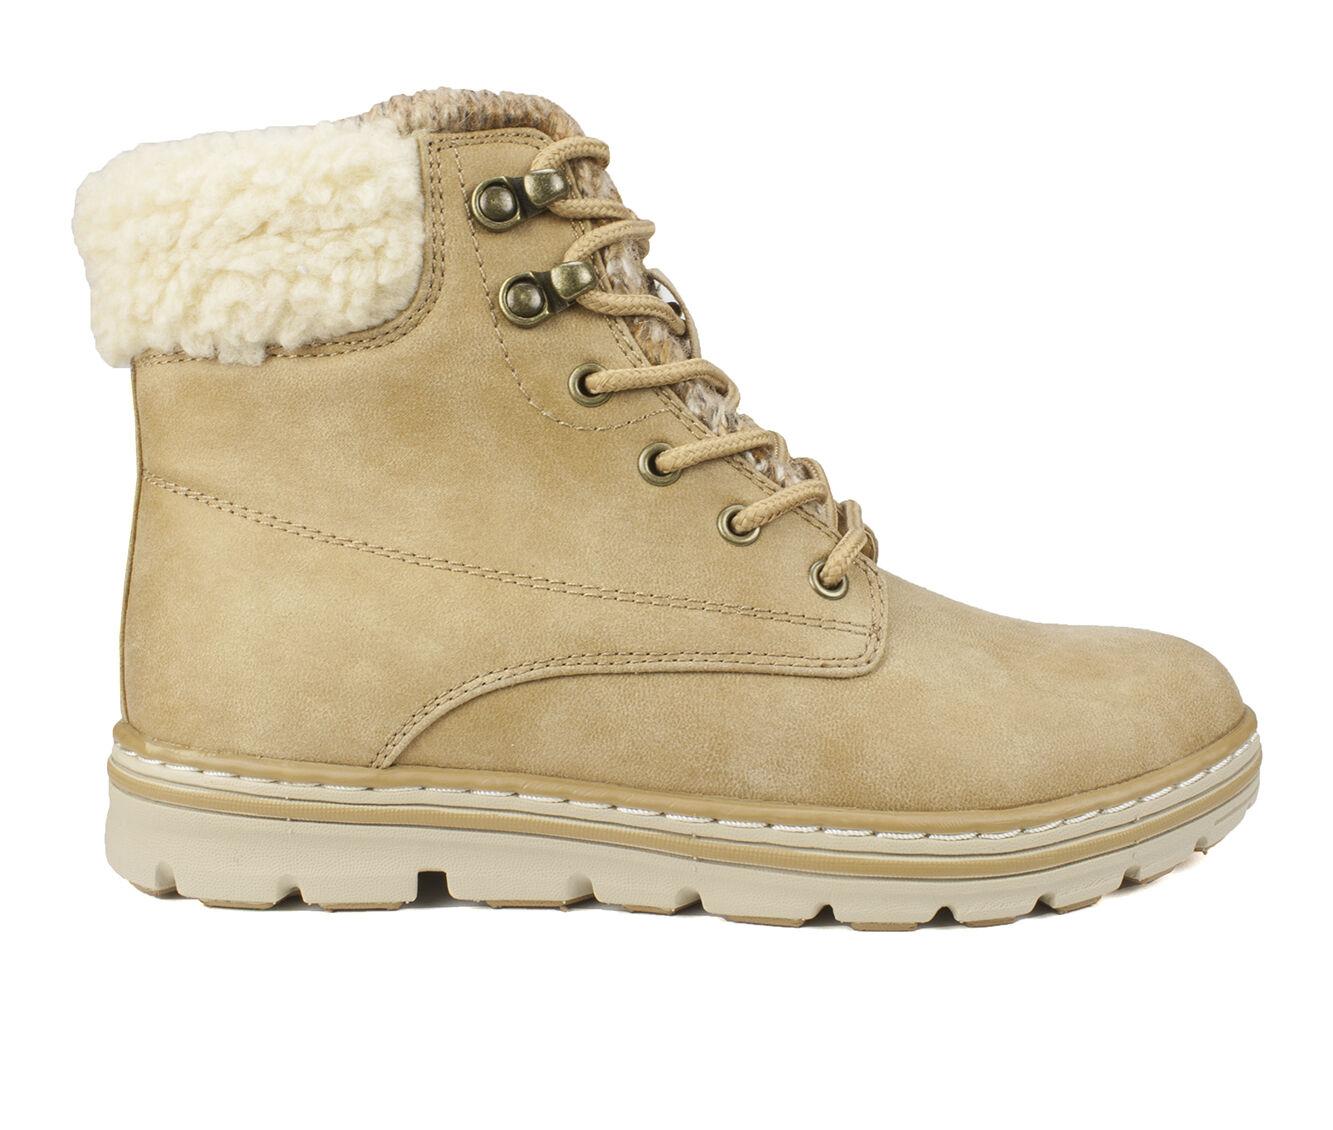 Superior Quality Women's Cliffs Karis Hiking Boots Wheat